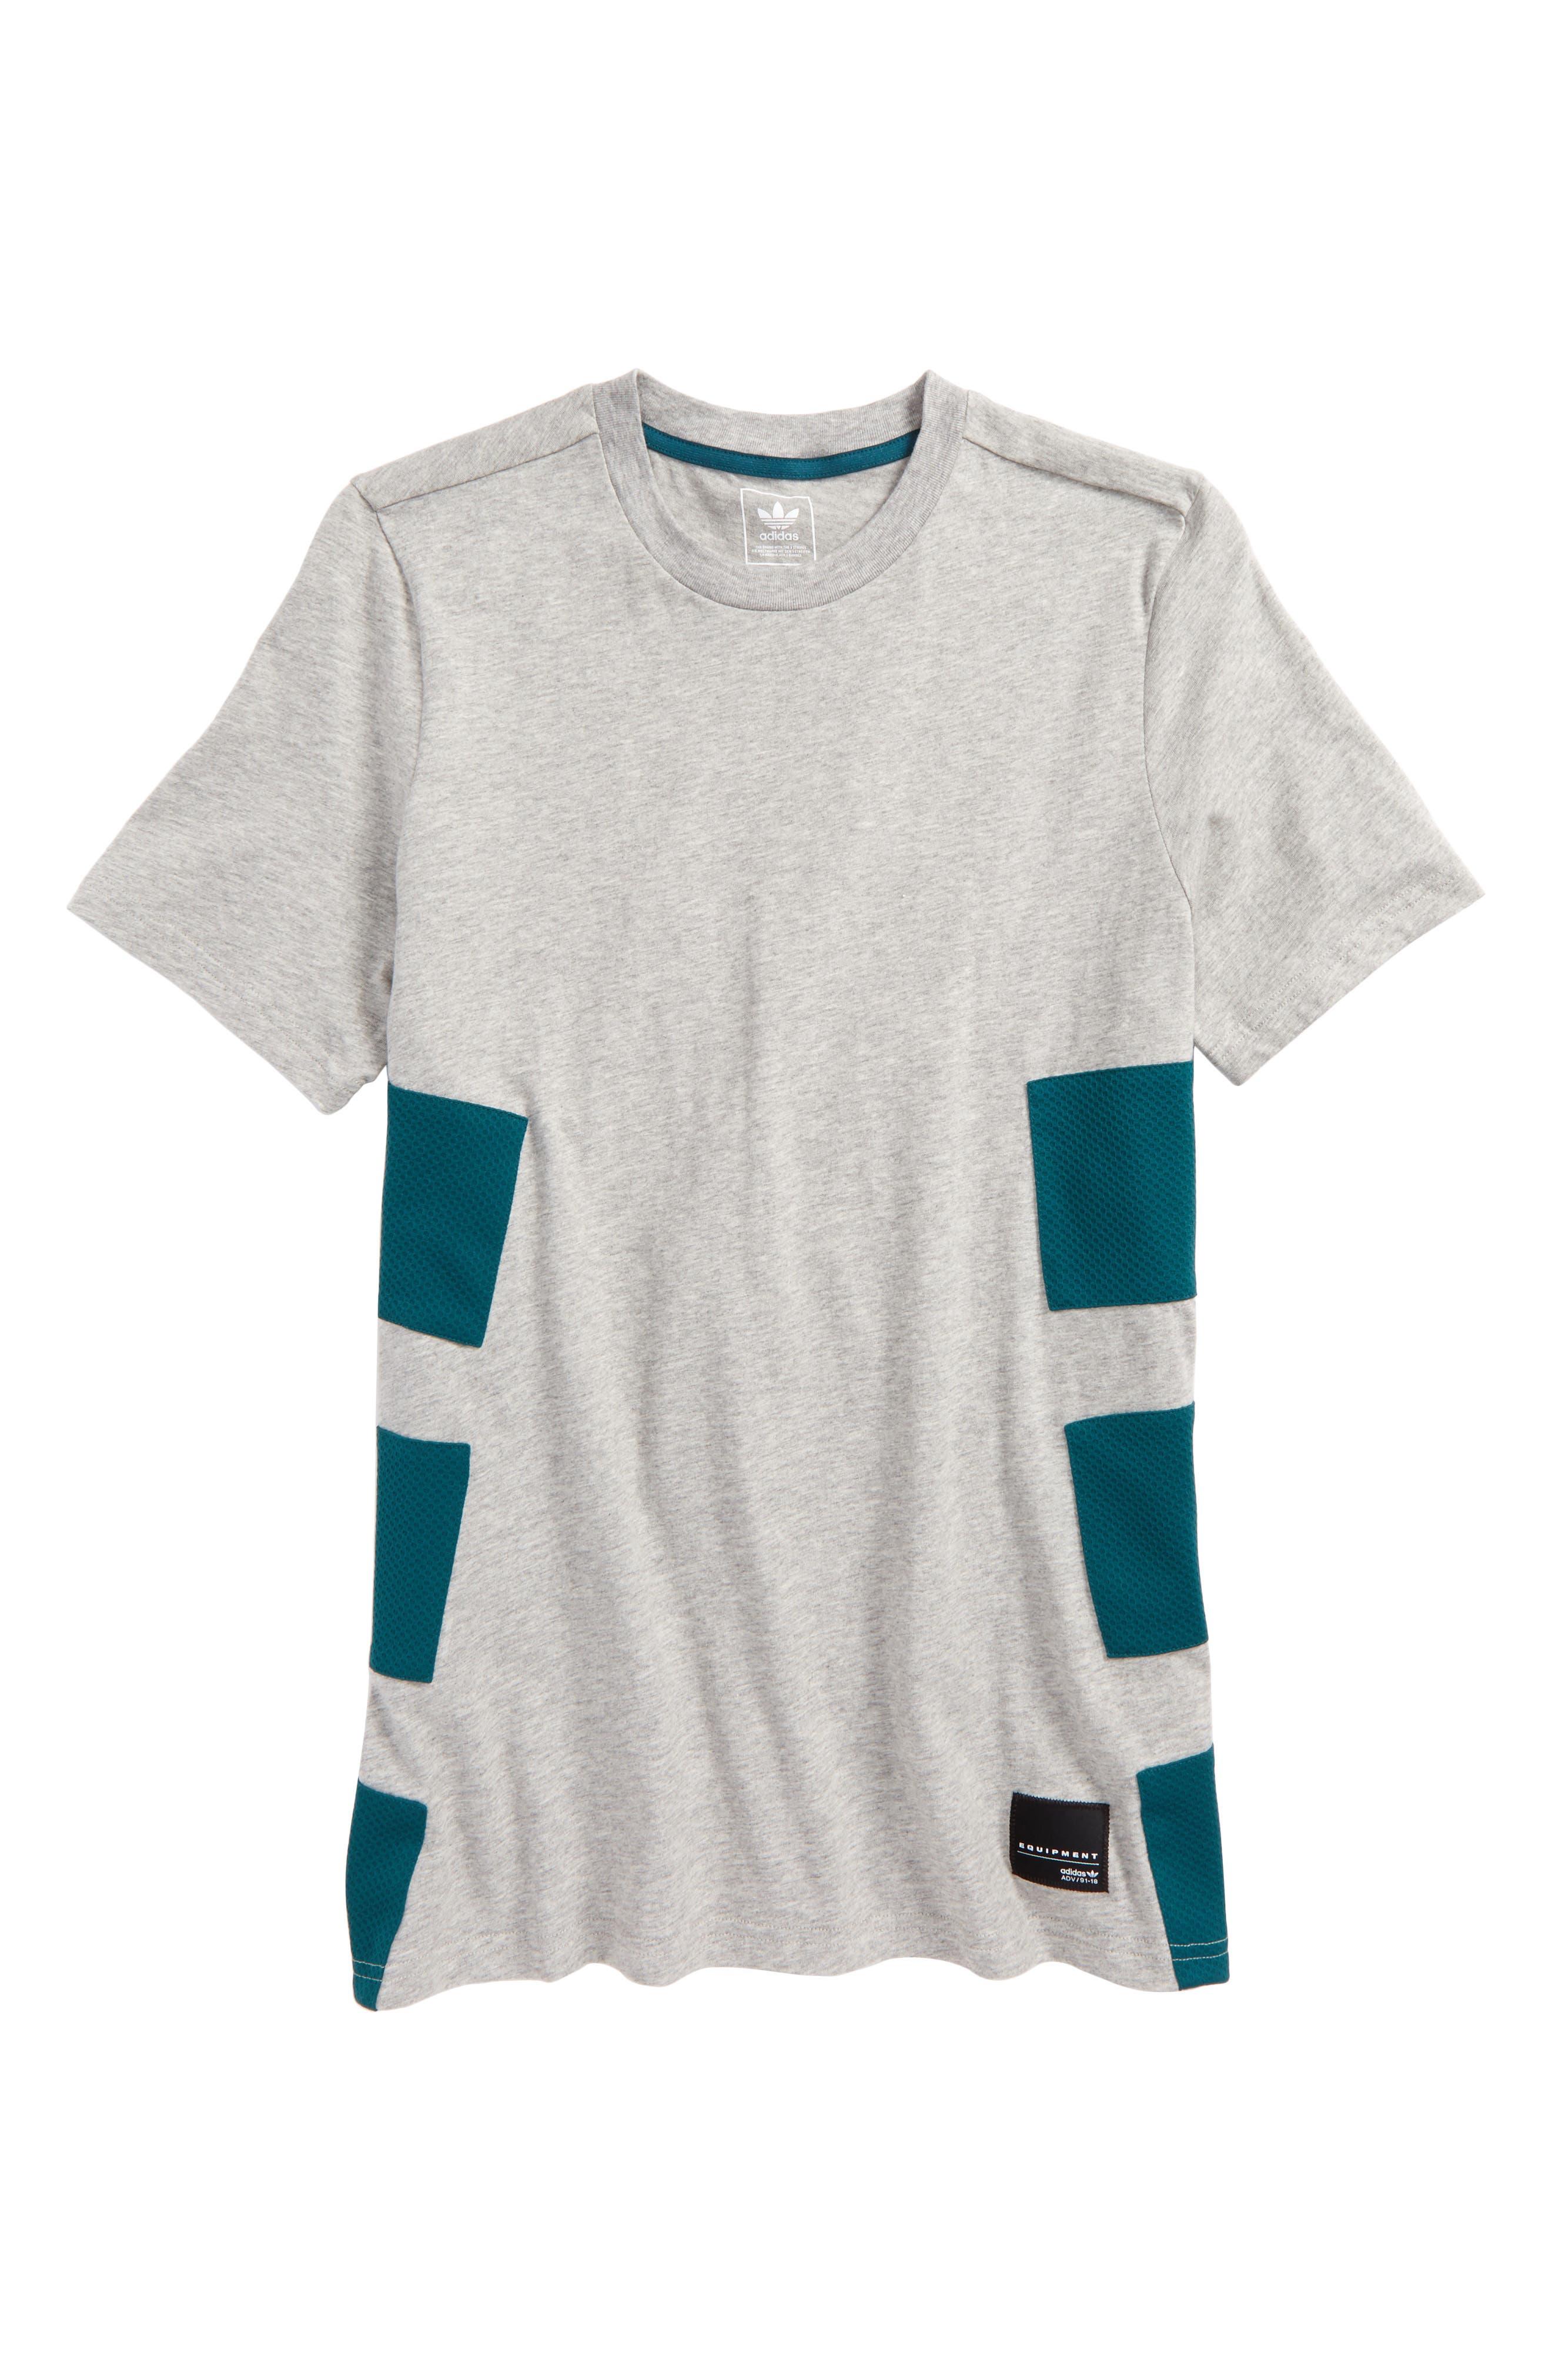 EQT T-Shirt,                             Main thumbnail 1, color,                             Grey/ Mystery Green